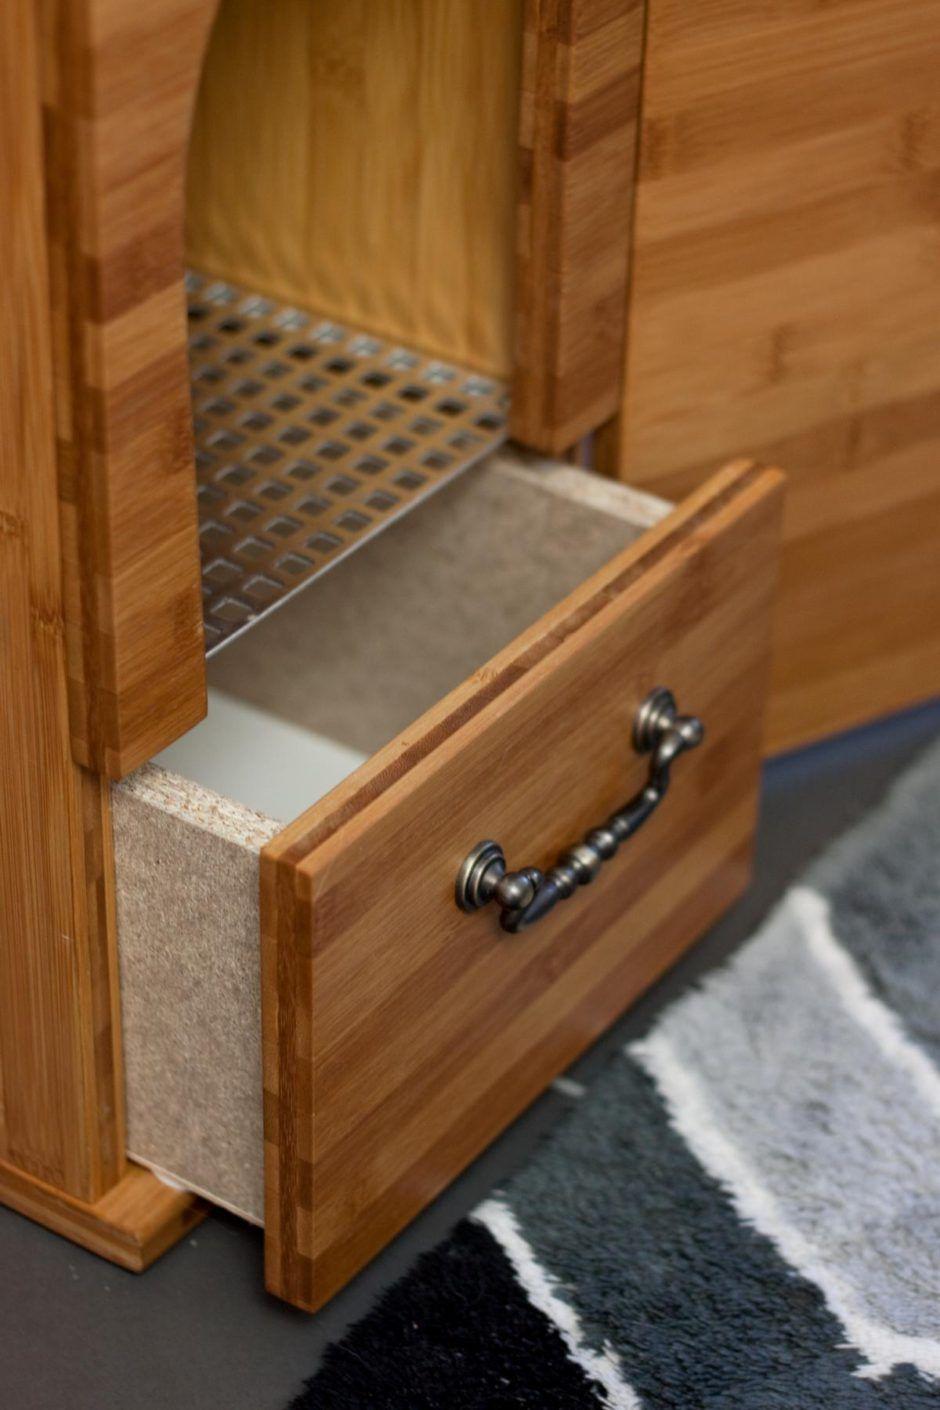 katzenklo detail 4 1 katzen pinterest cat litter box and animal. Black Bedroom Furniture Sets. Home Design Ideas